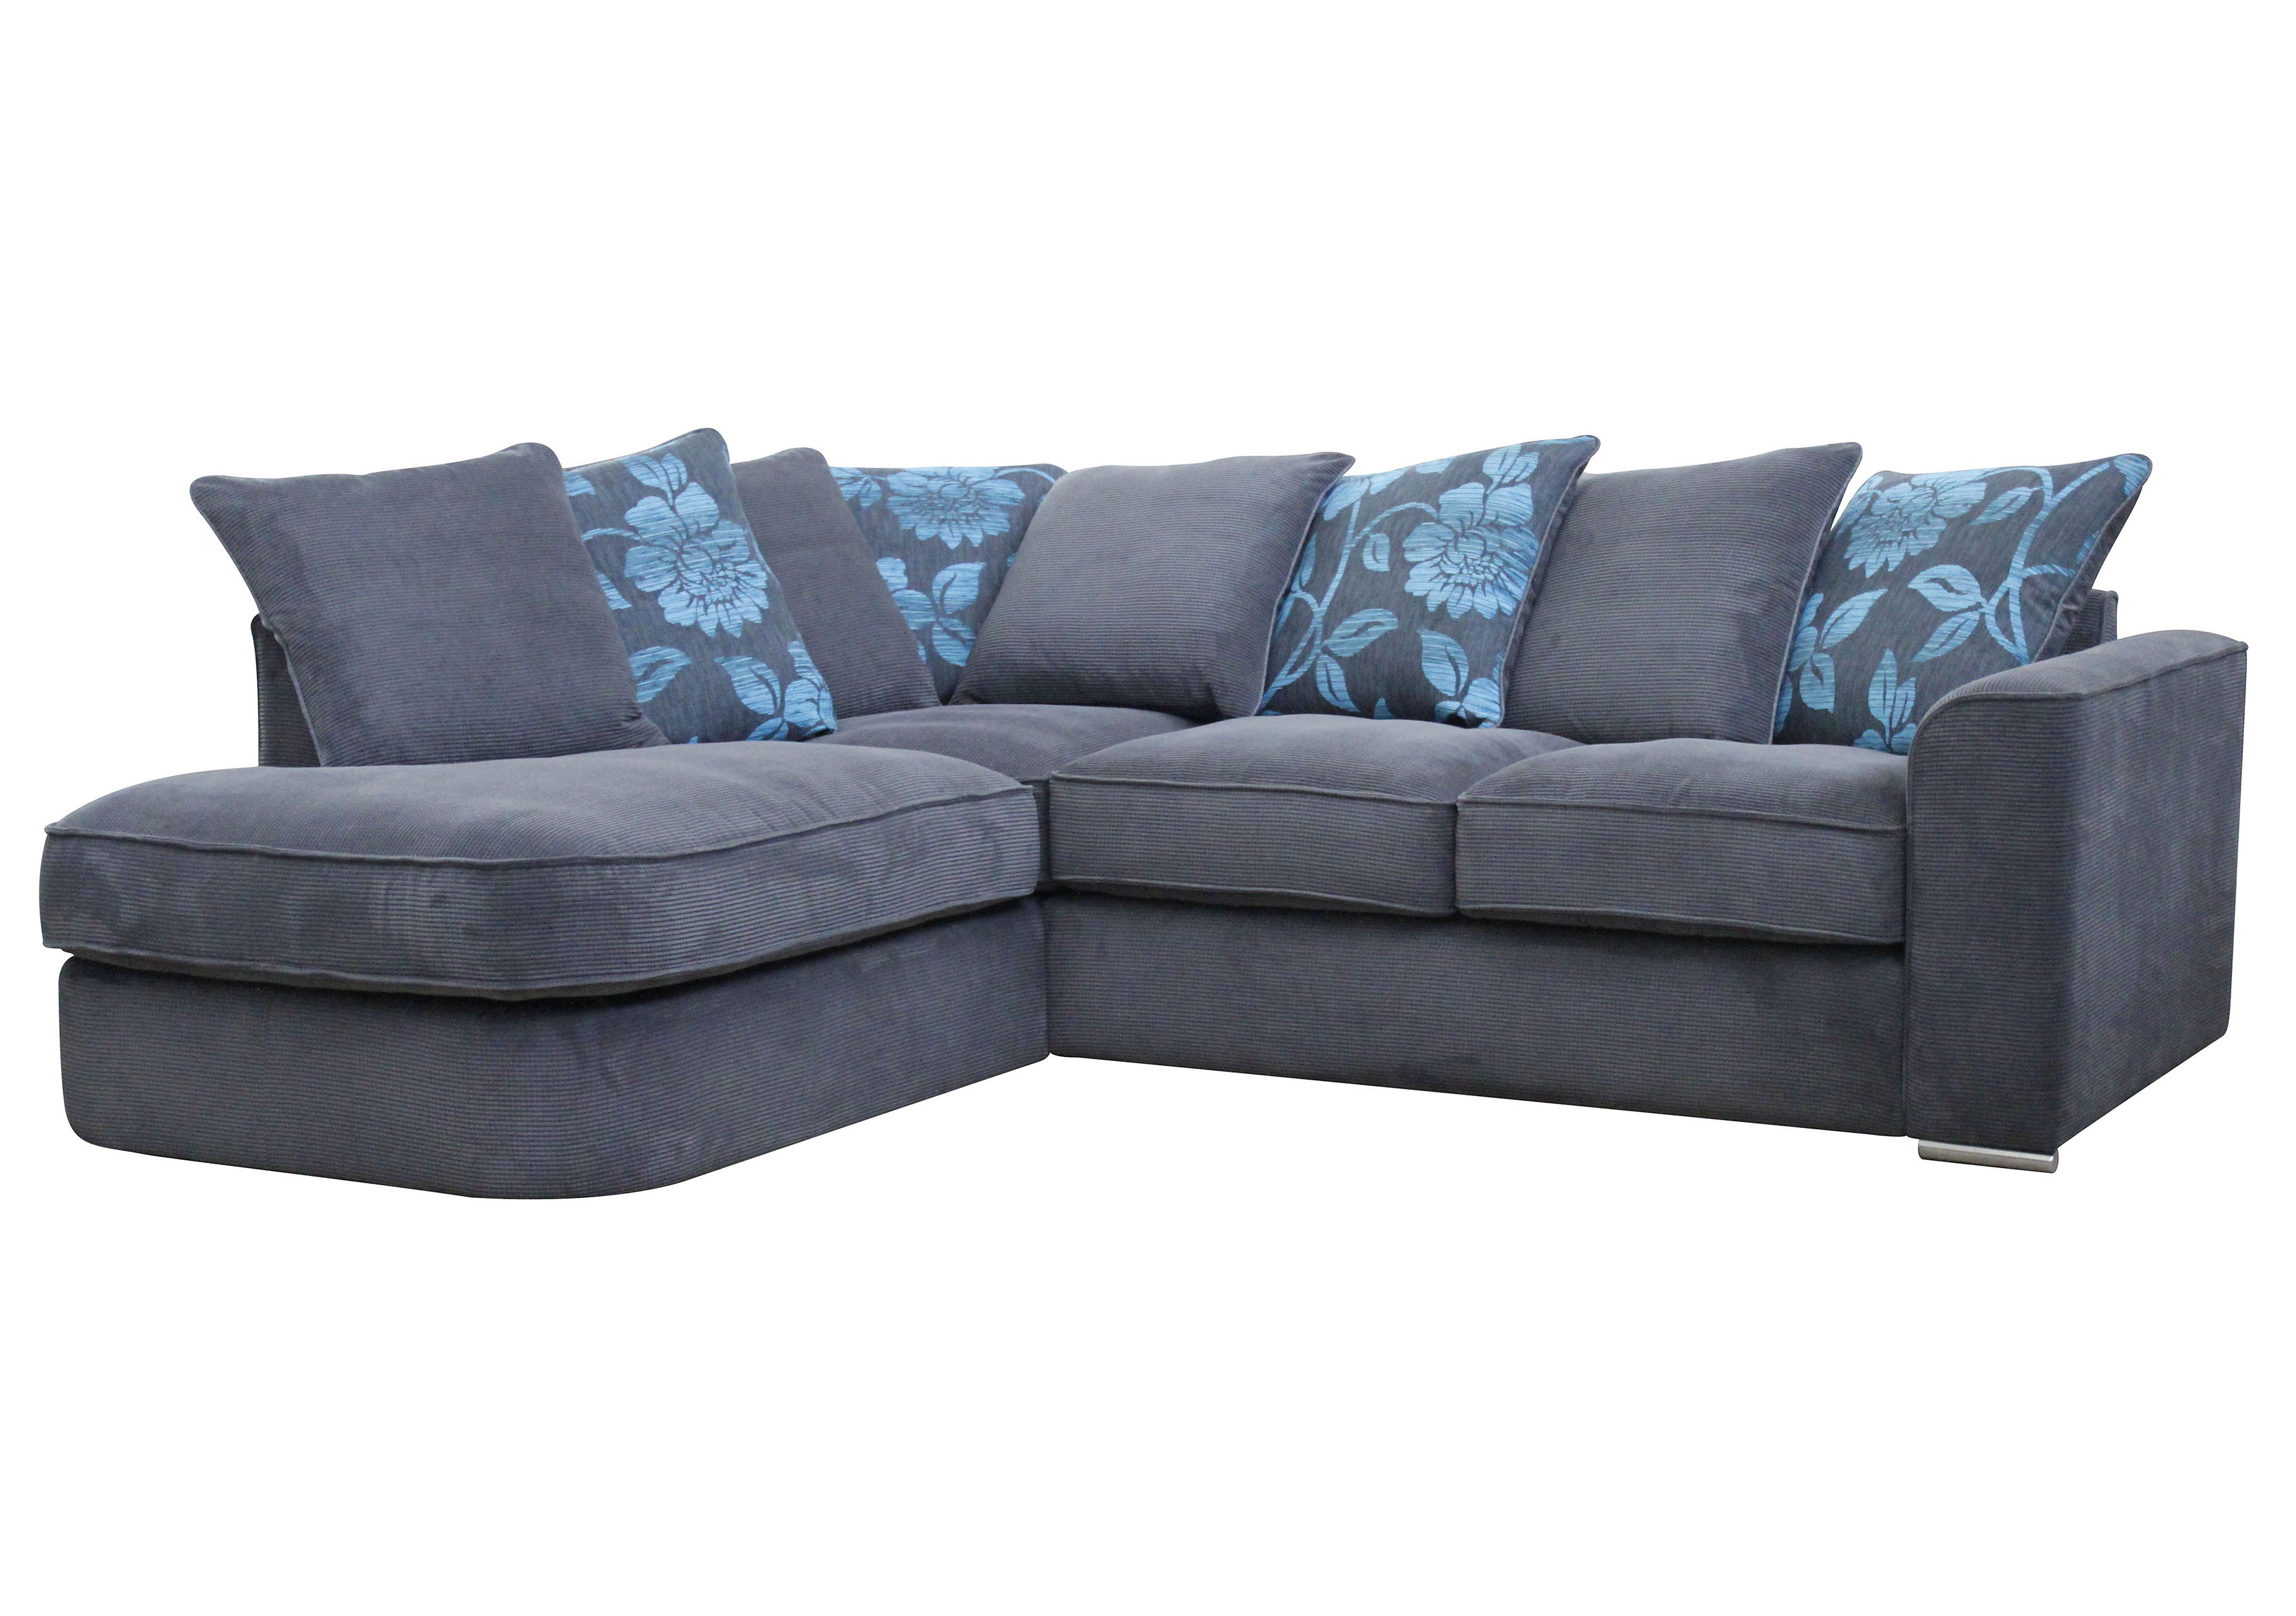 Furniture Village Apex boardwalk fabric pillow back corner chaise sofa - furniture village